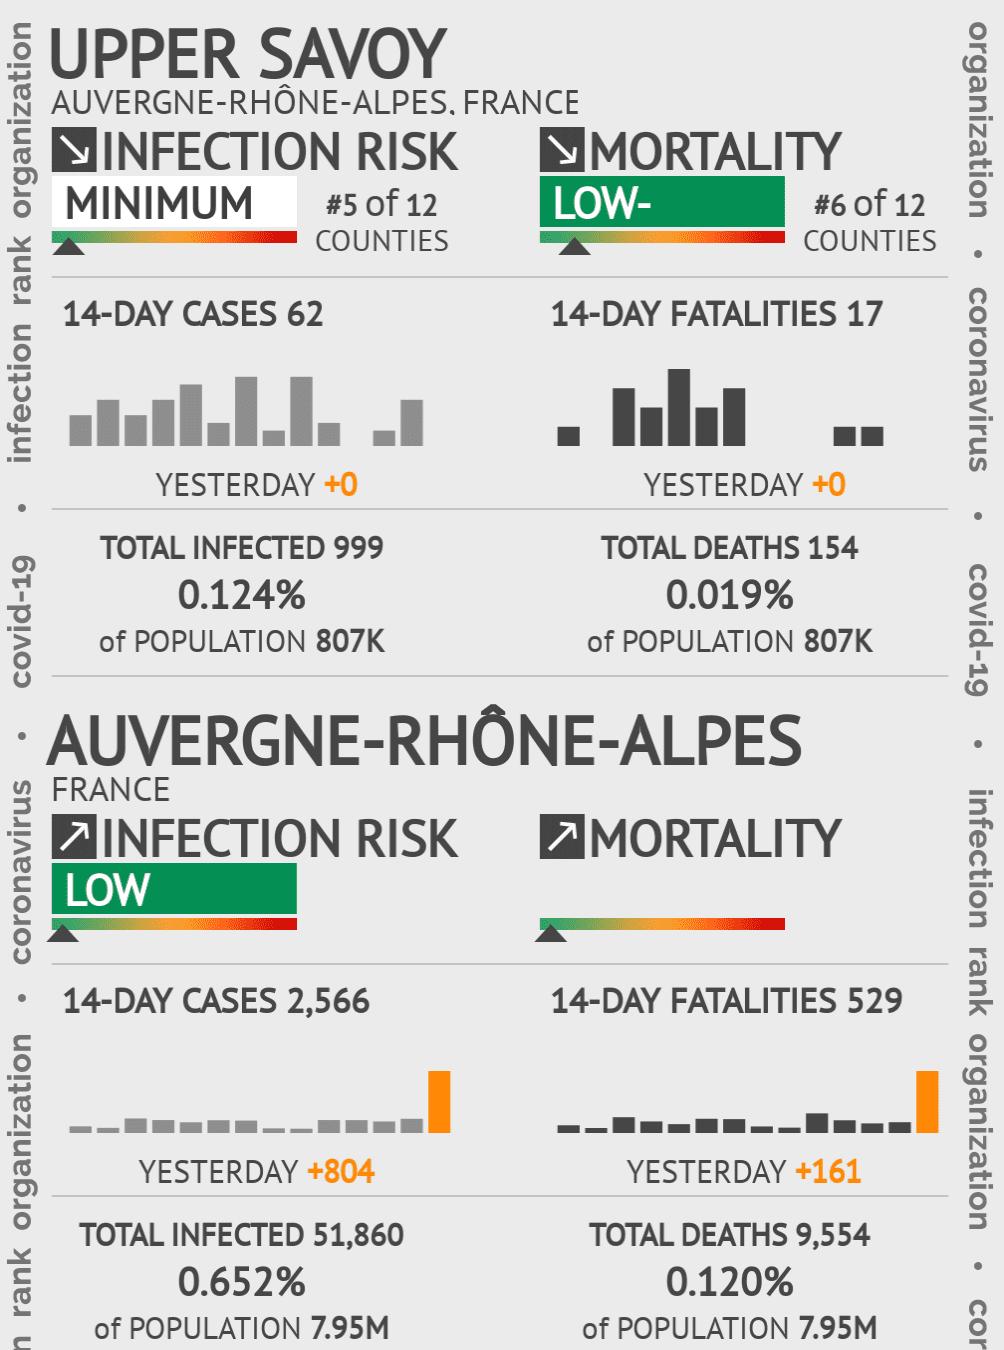 Upper Savoy Coronavirus Covid-19 Risk of Infection on May 14, 2020